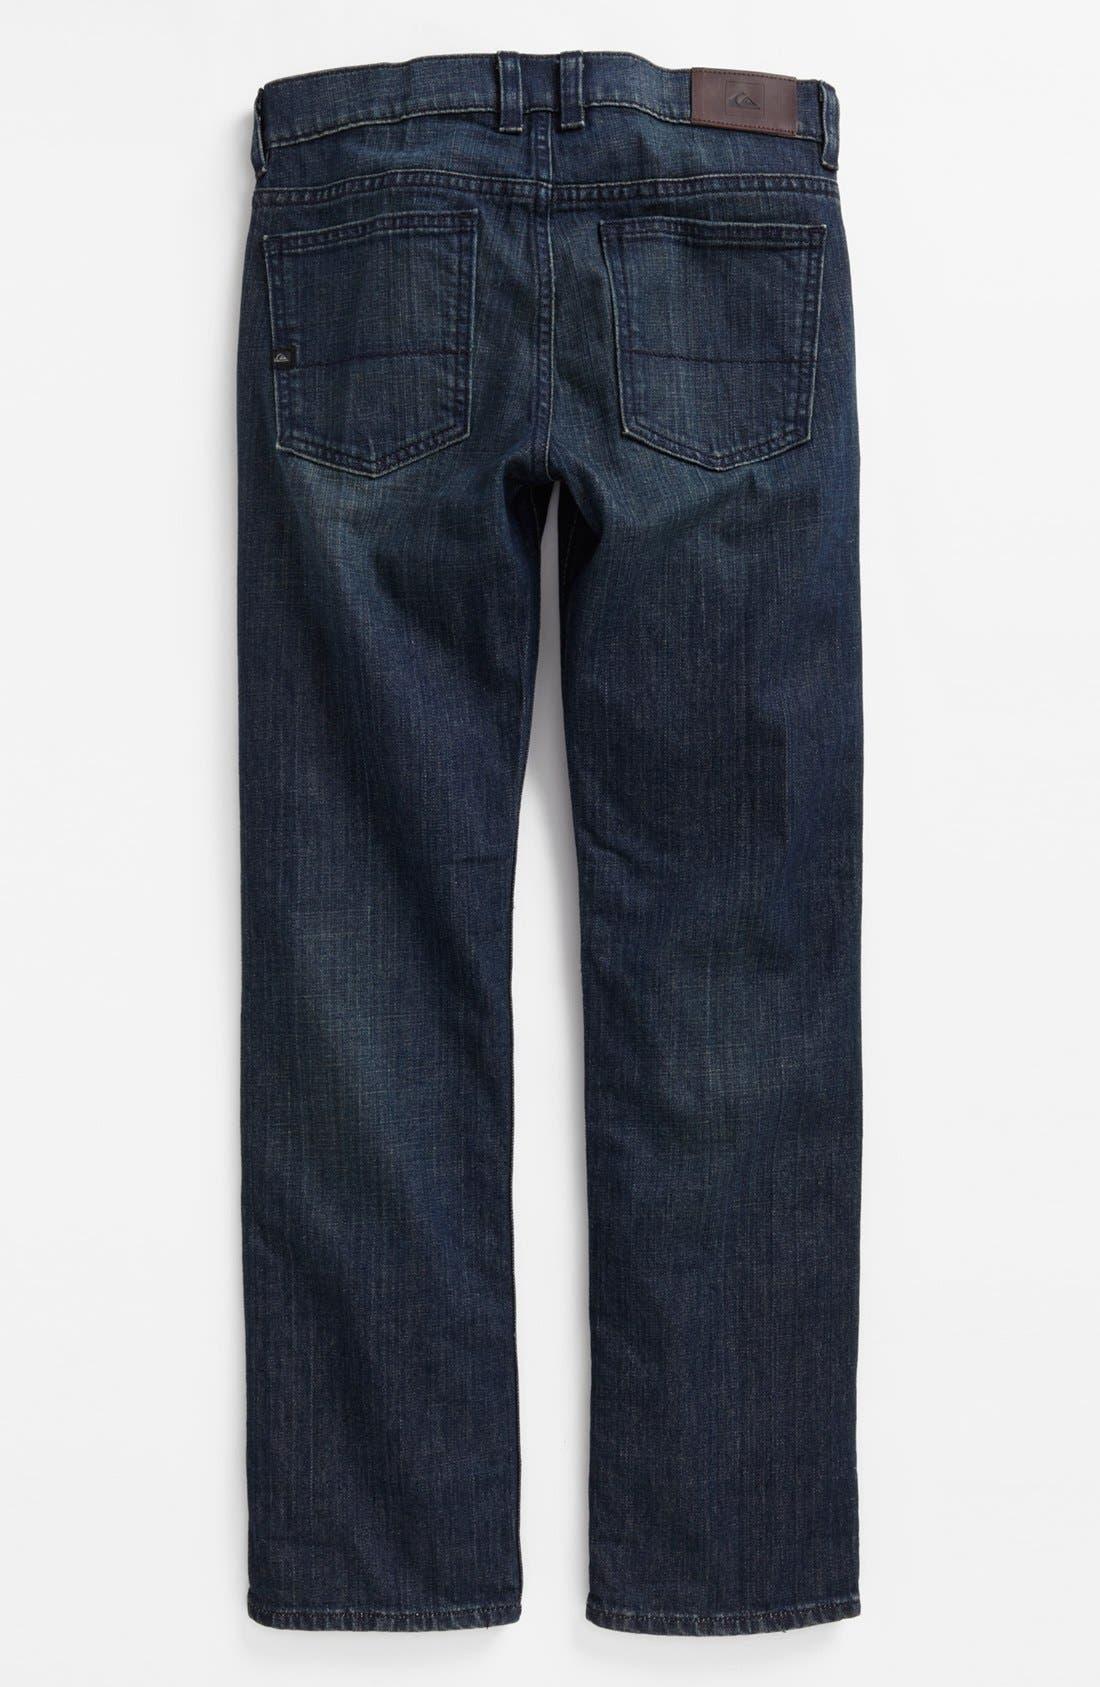 Alternate Image 1 Selected - Quiksilver 'Revolver' Straight Leg Jeans (Big Boys)